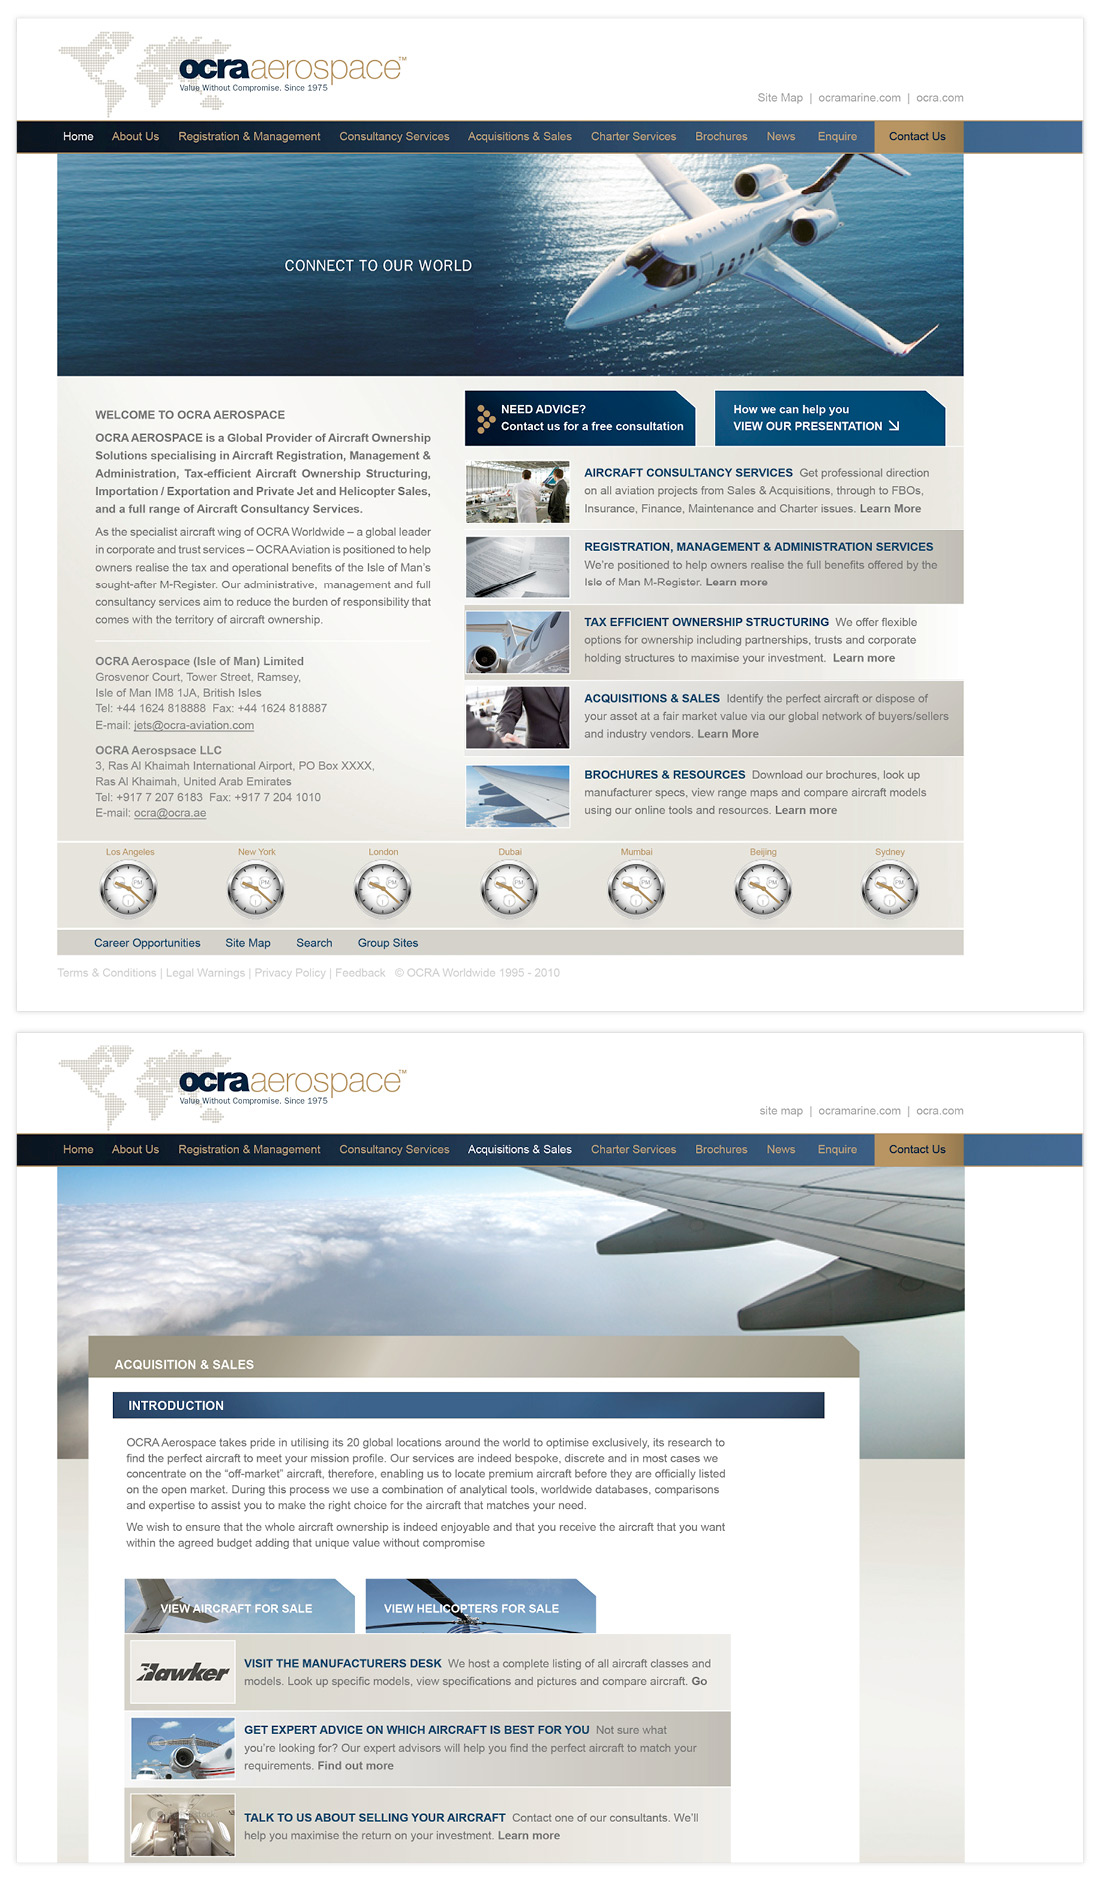 Website Design - Design 4 Business